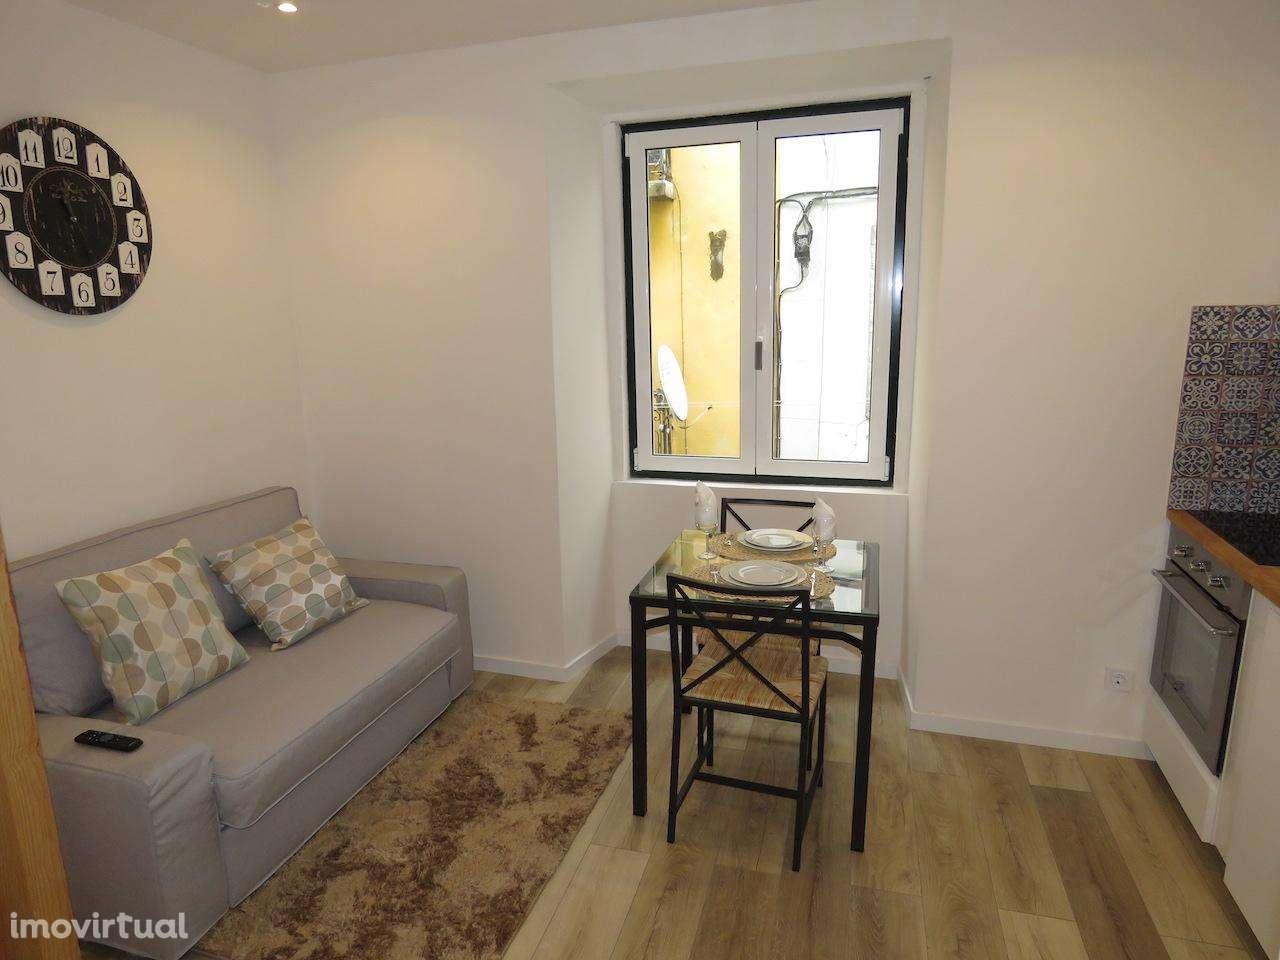 Apartamento para comprar, Arroios, Lisboa - Foto 2